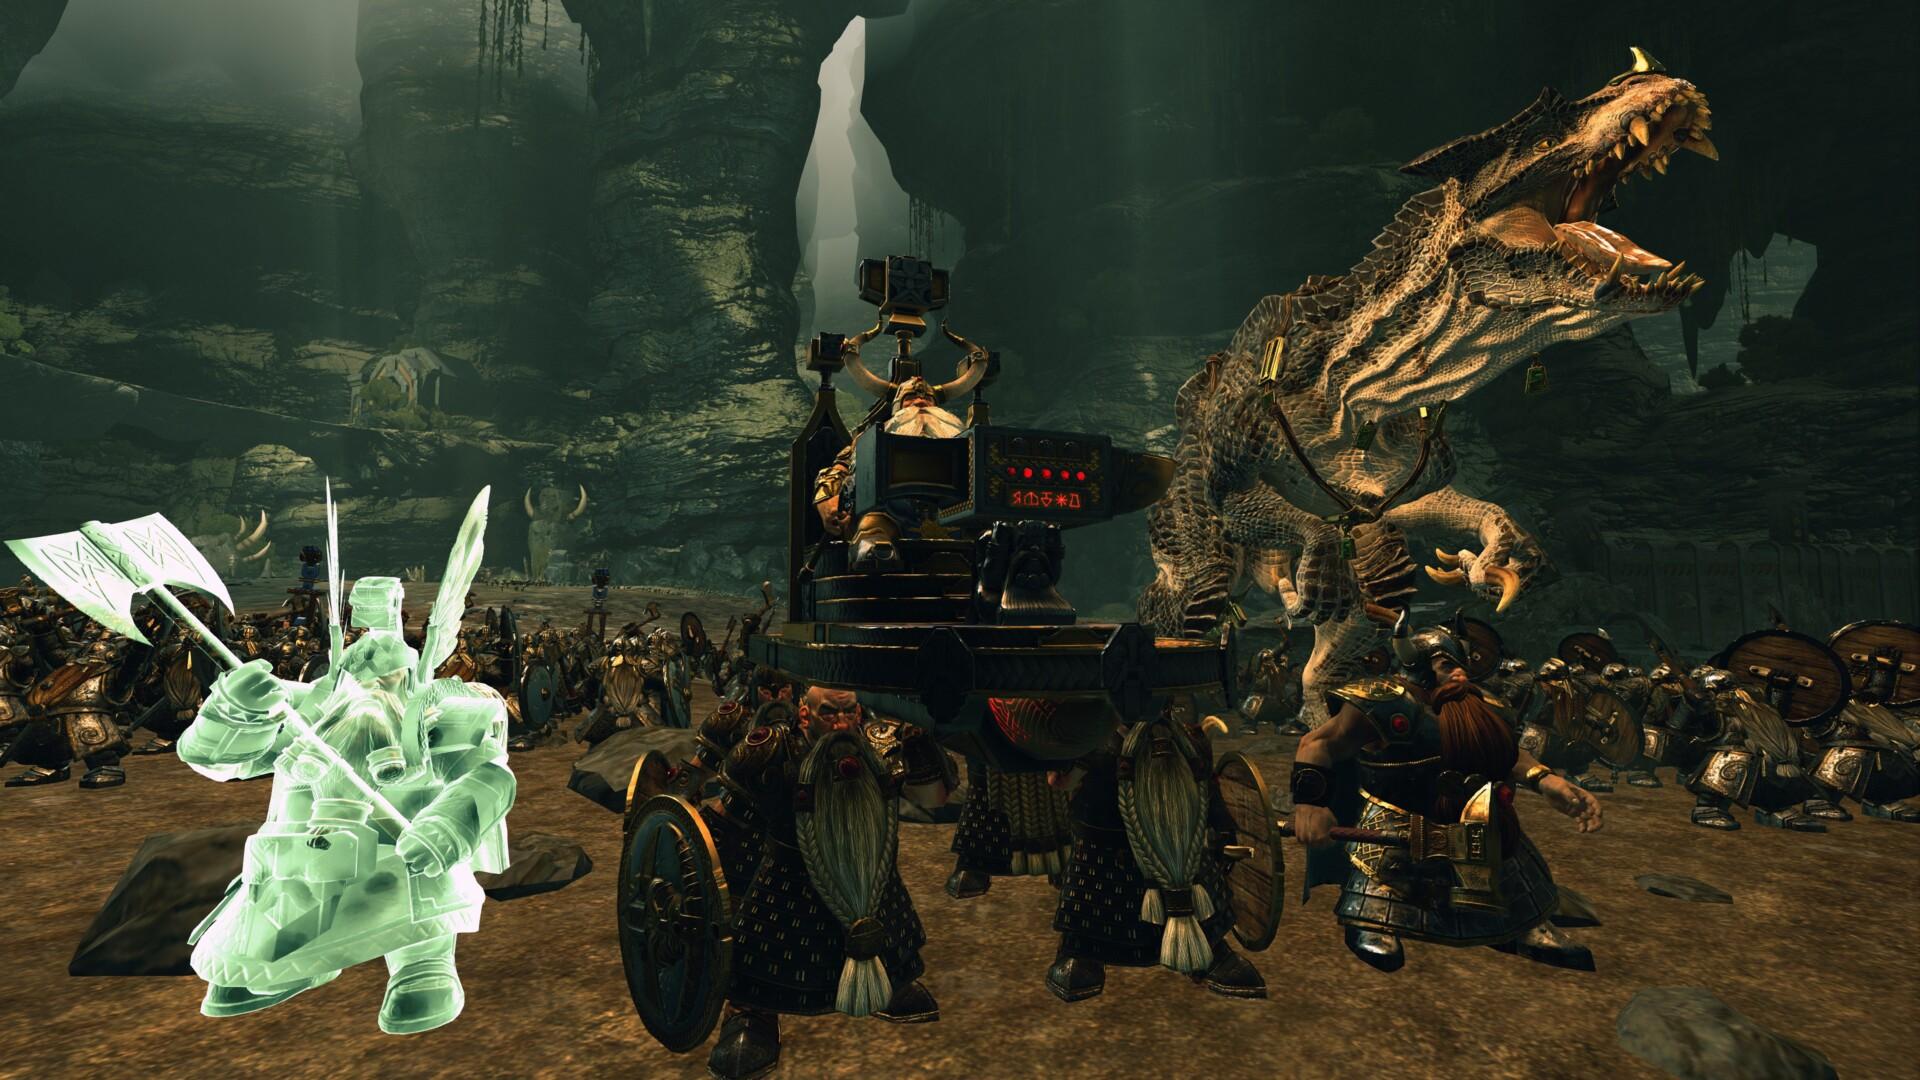 Total War: Warhammer II -- Thorek Ironbrow Artifact Vault guide